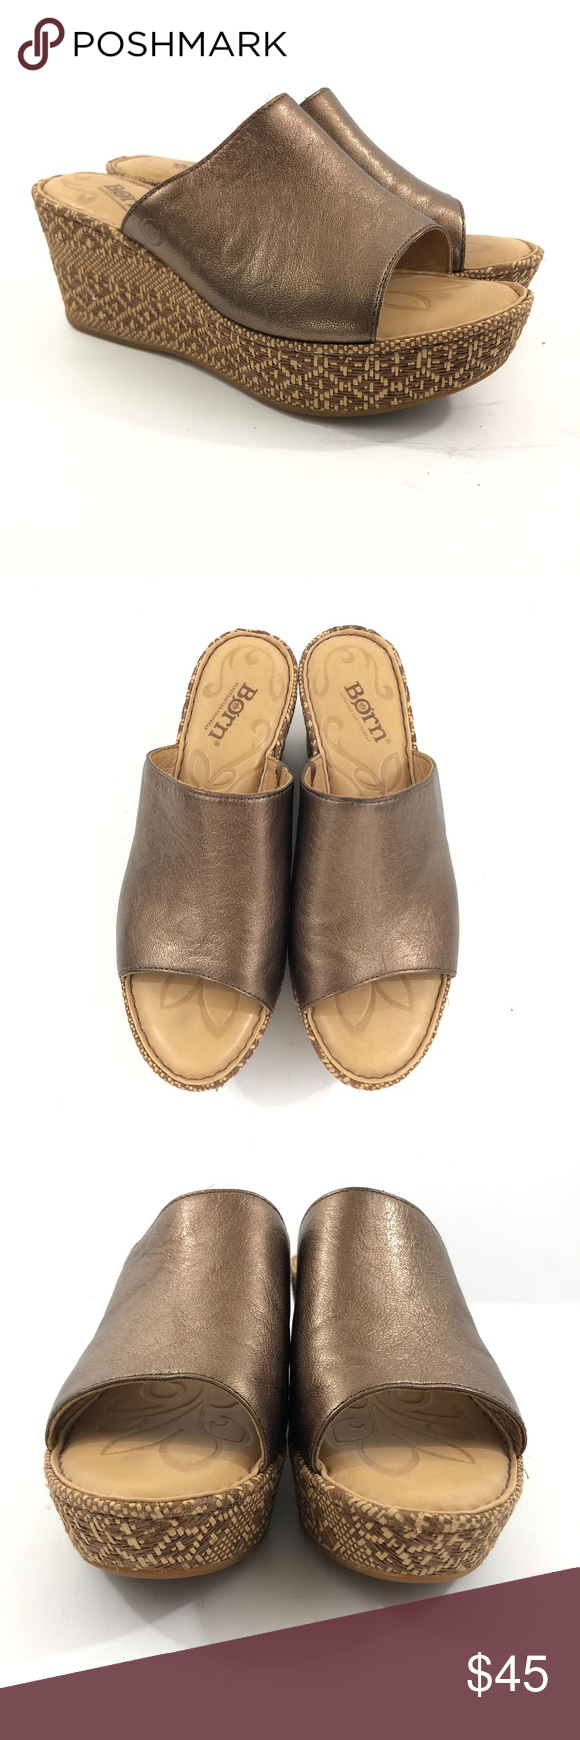 b2ab7b2422f8 Born Tilda Bronze Platform Wedge Sandals Size 7 Born Tilda Bronze Platform  Wedge Sandals Size 7